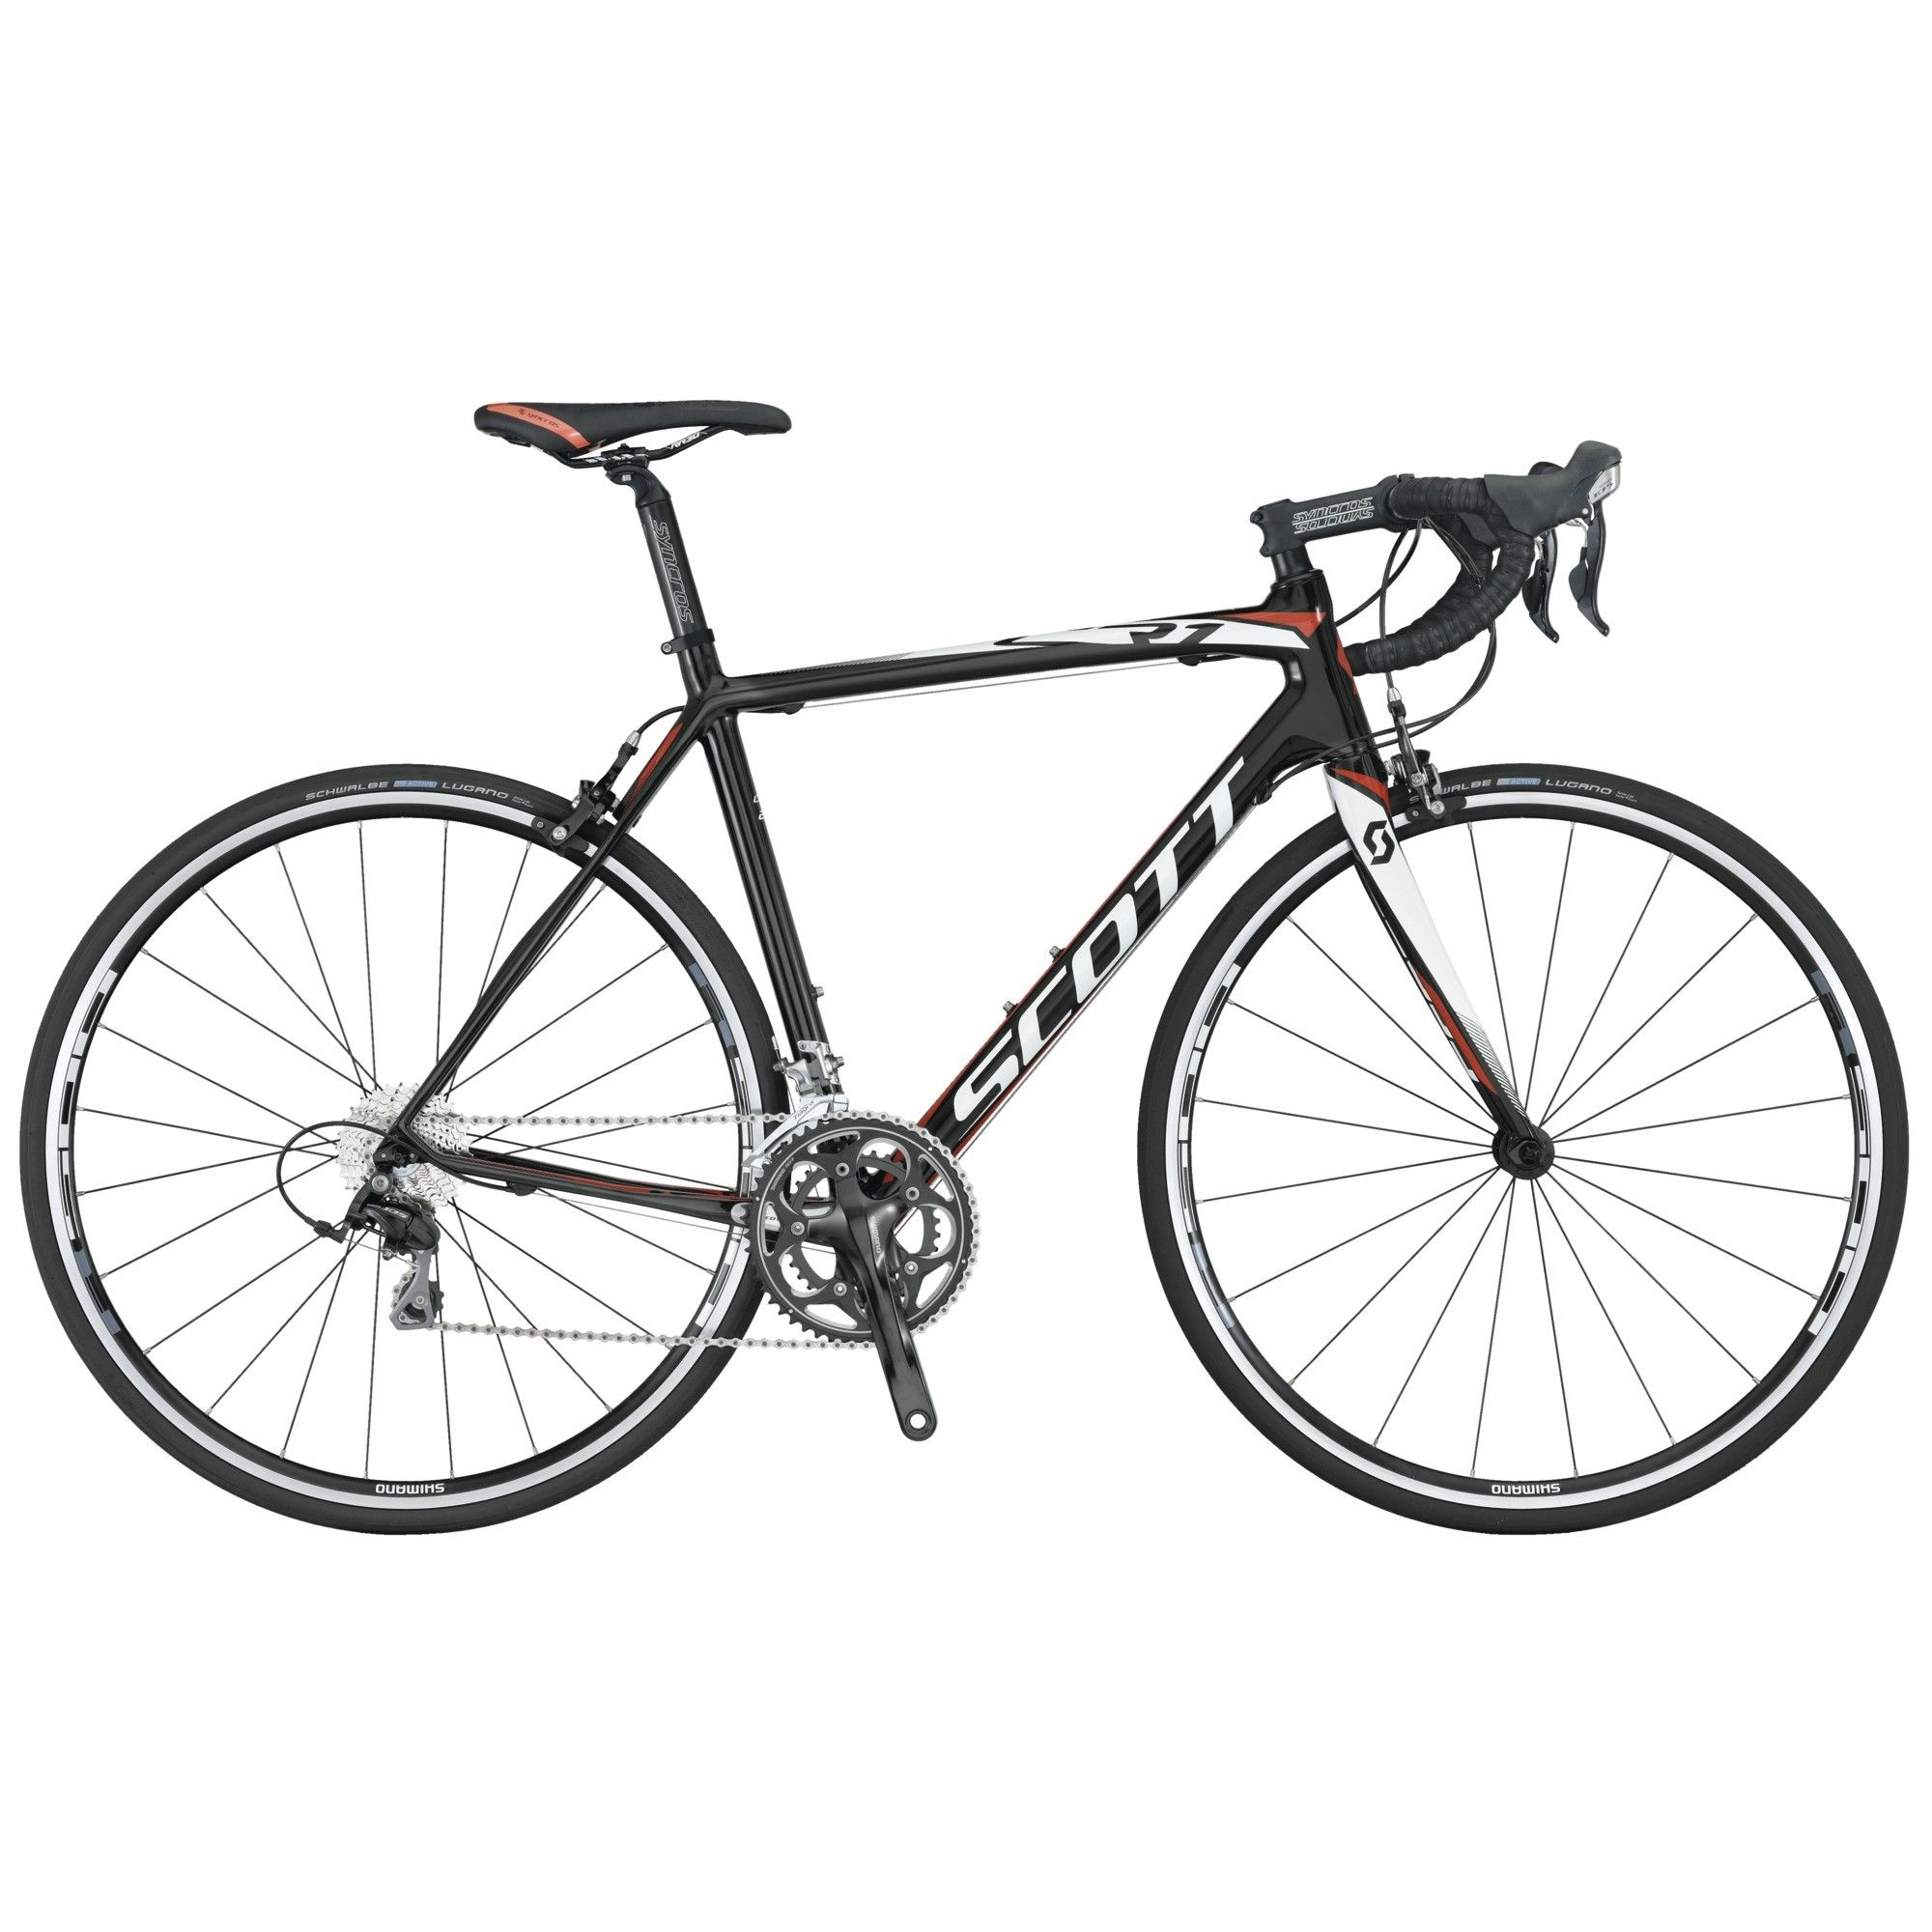 Scott cr1 20 scott cr1road bikehtmlbicycle